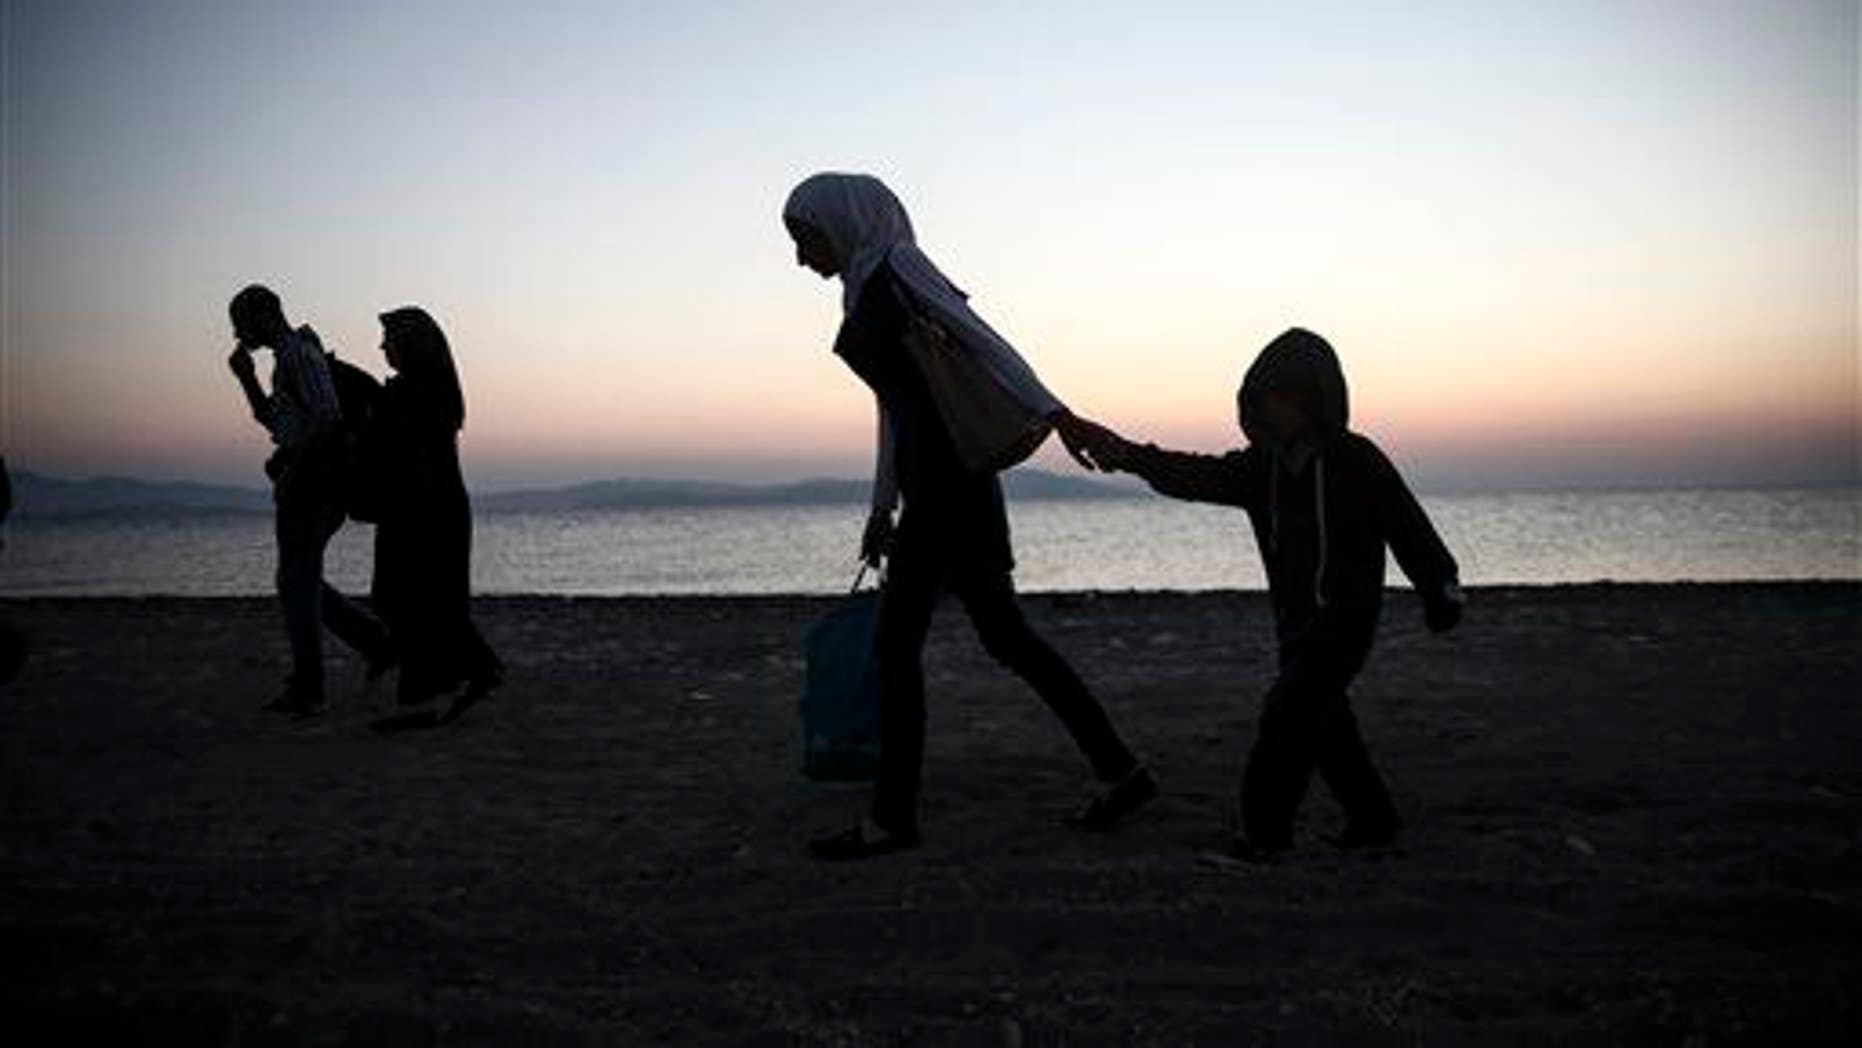 People walk along a beach on the Greek southeastern island of Kos, Wednesday, Aug. 12, 2015.